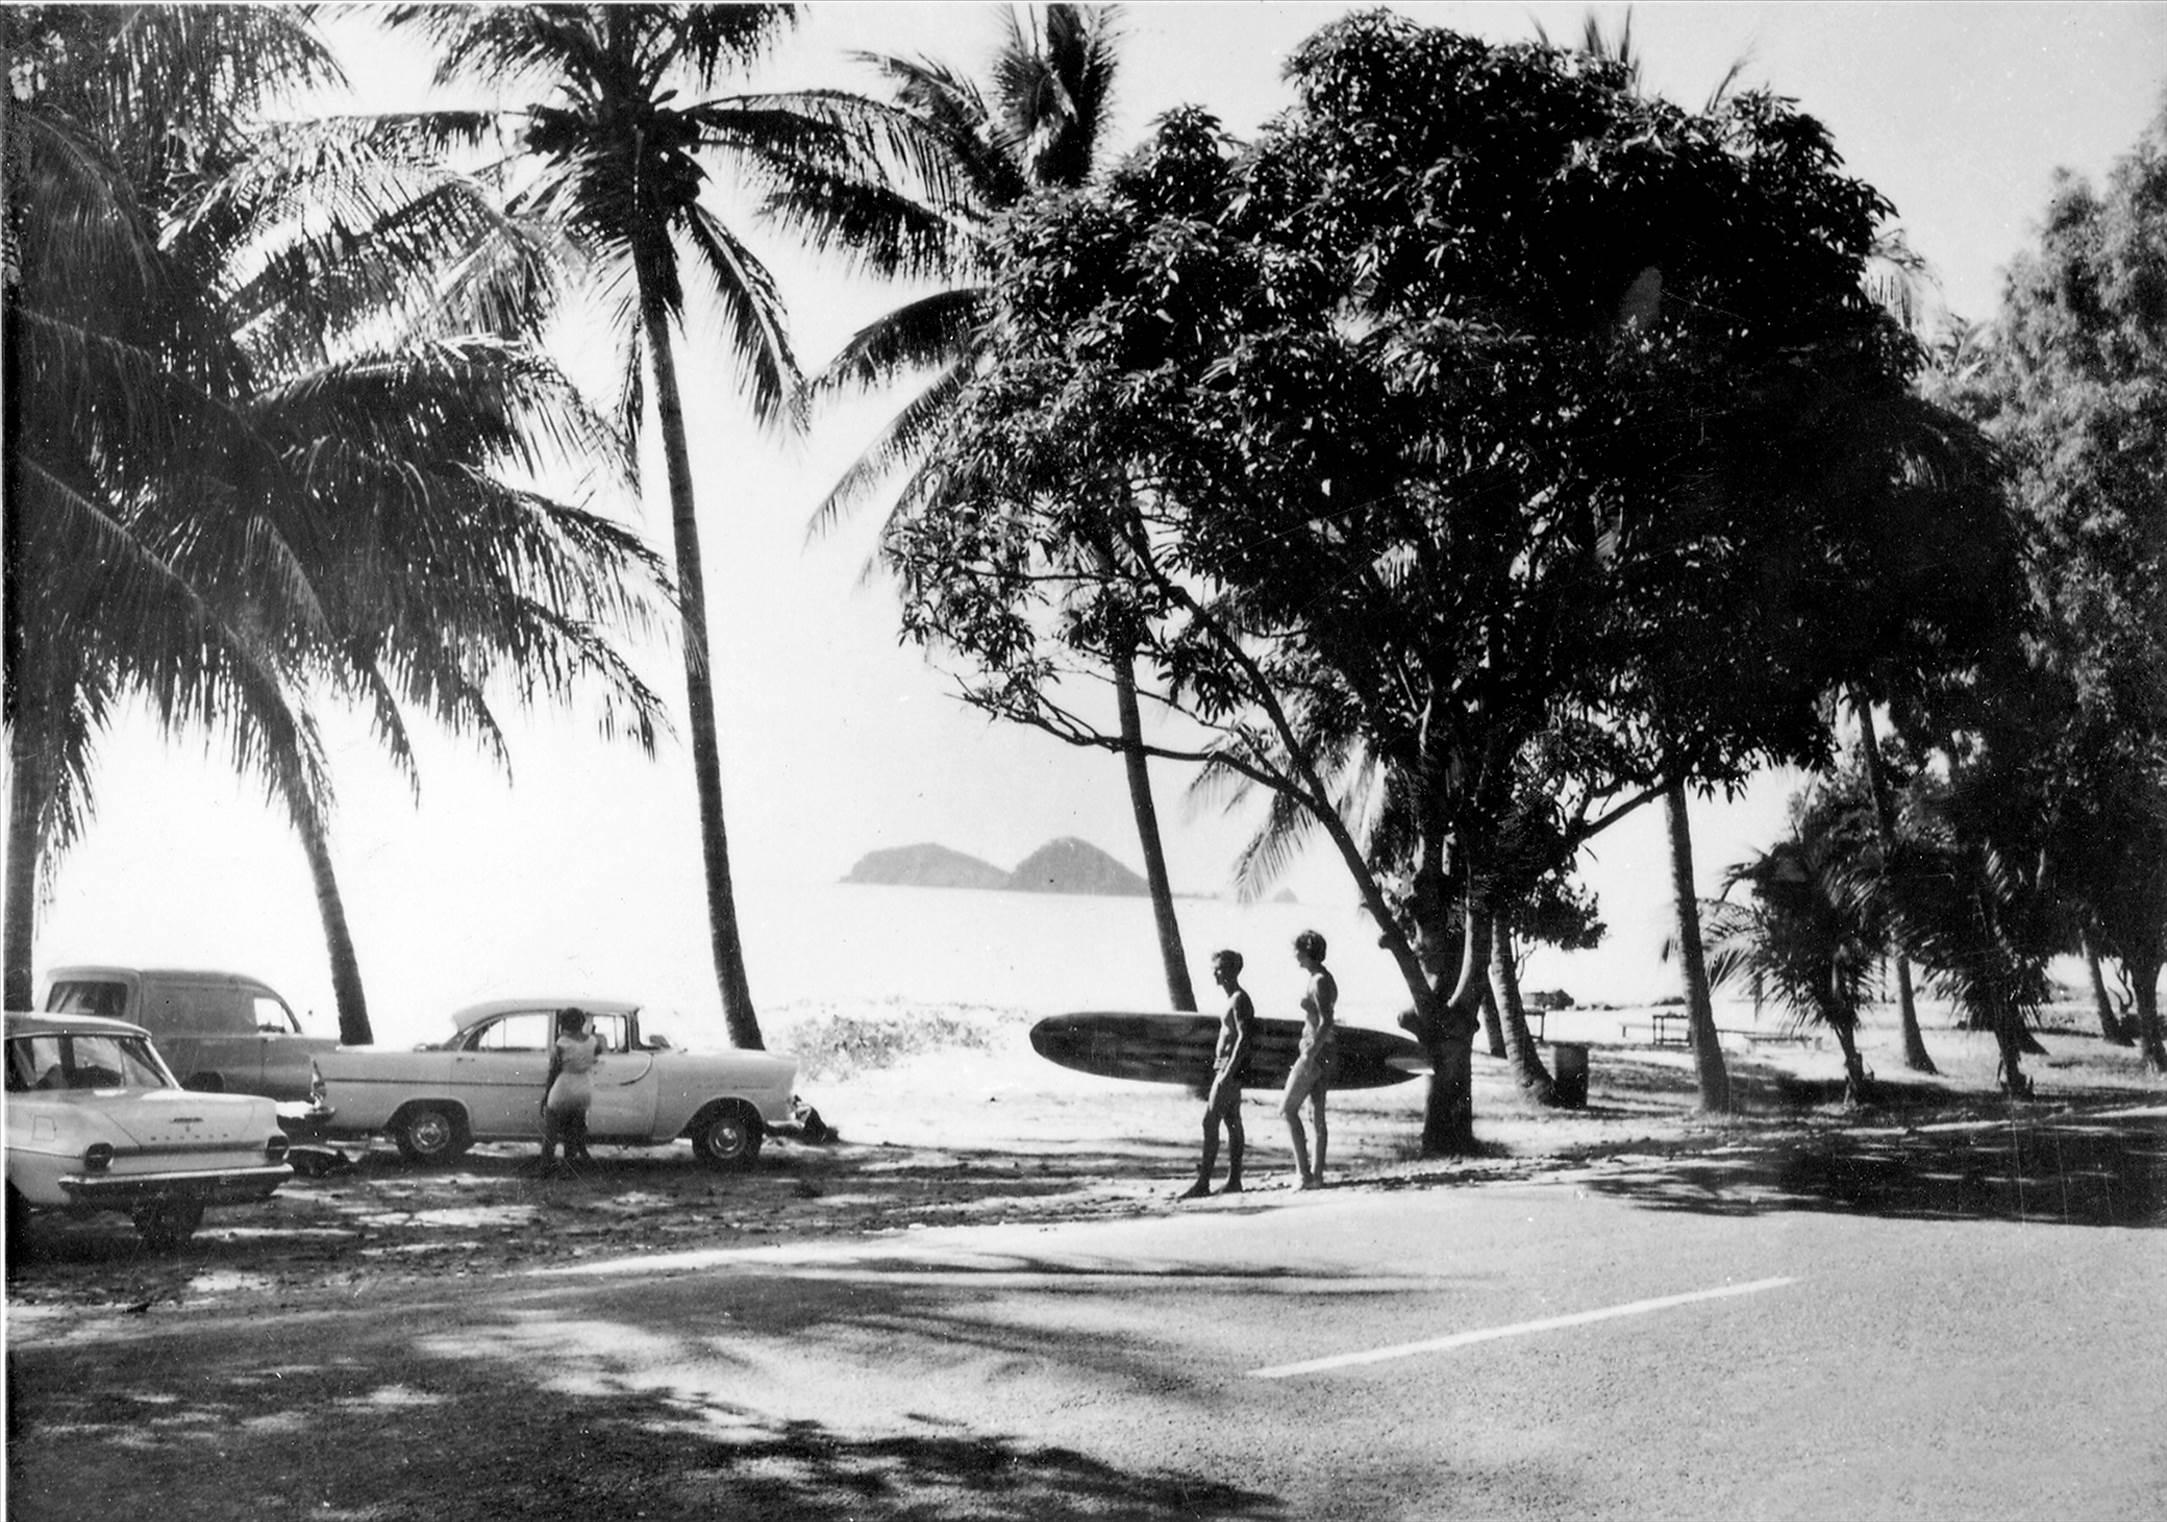 surfing ellis beach north cairns 1965 photo. Black Bedroom Furniture Sets. Home Design Ideas